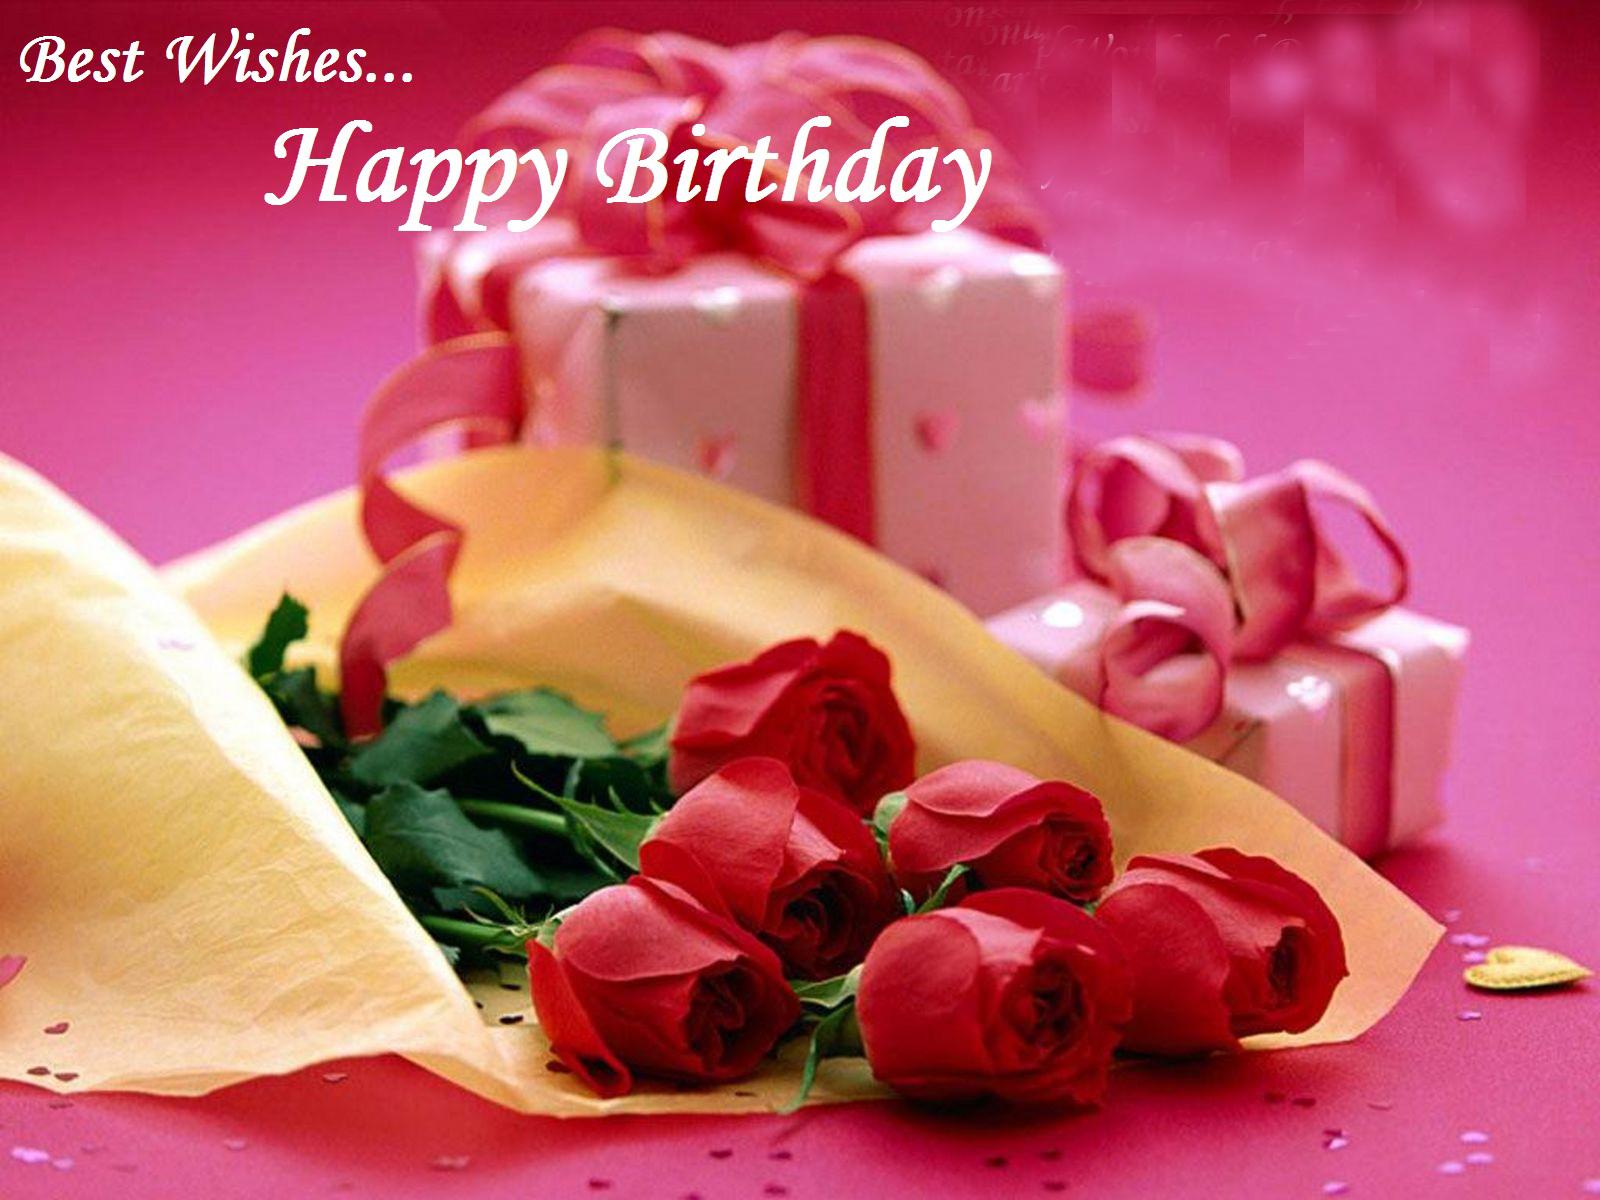 Happy-Birthday-Beautiful-Gifts-Pics-67.jpg